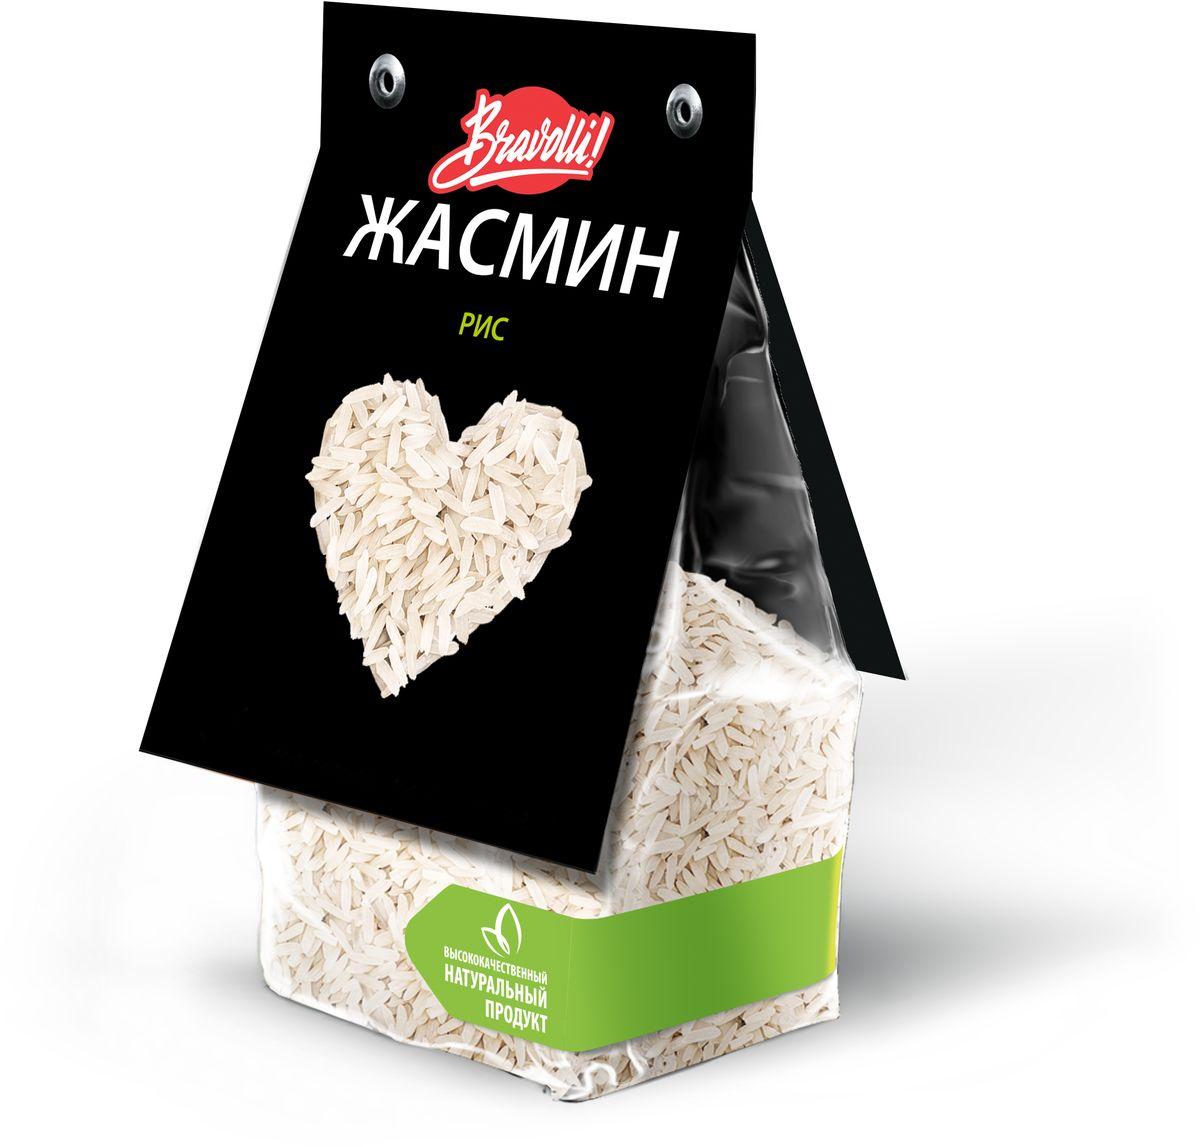 Bravolli Жасмин рис, 350 г цены